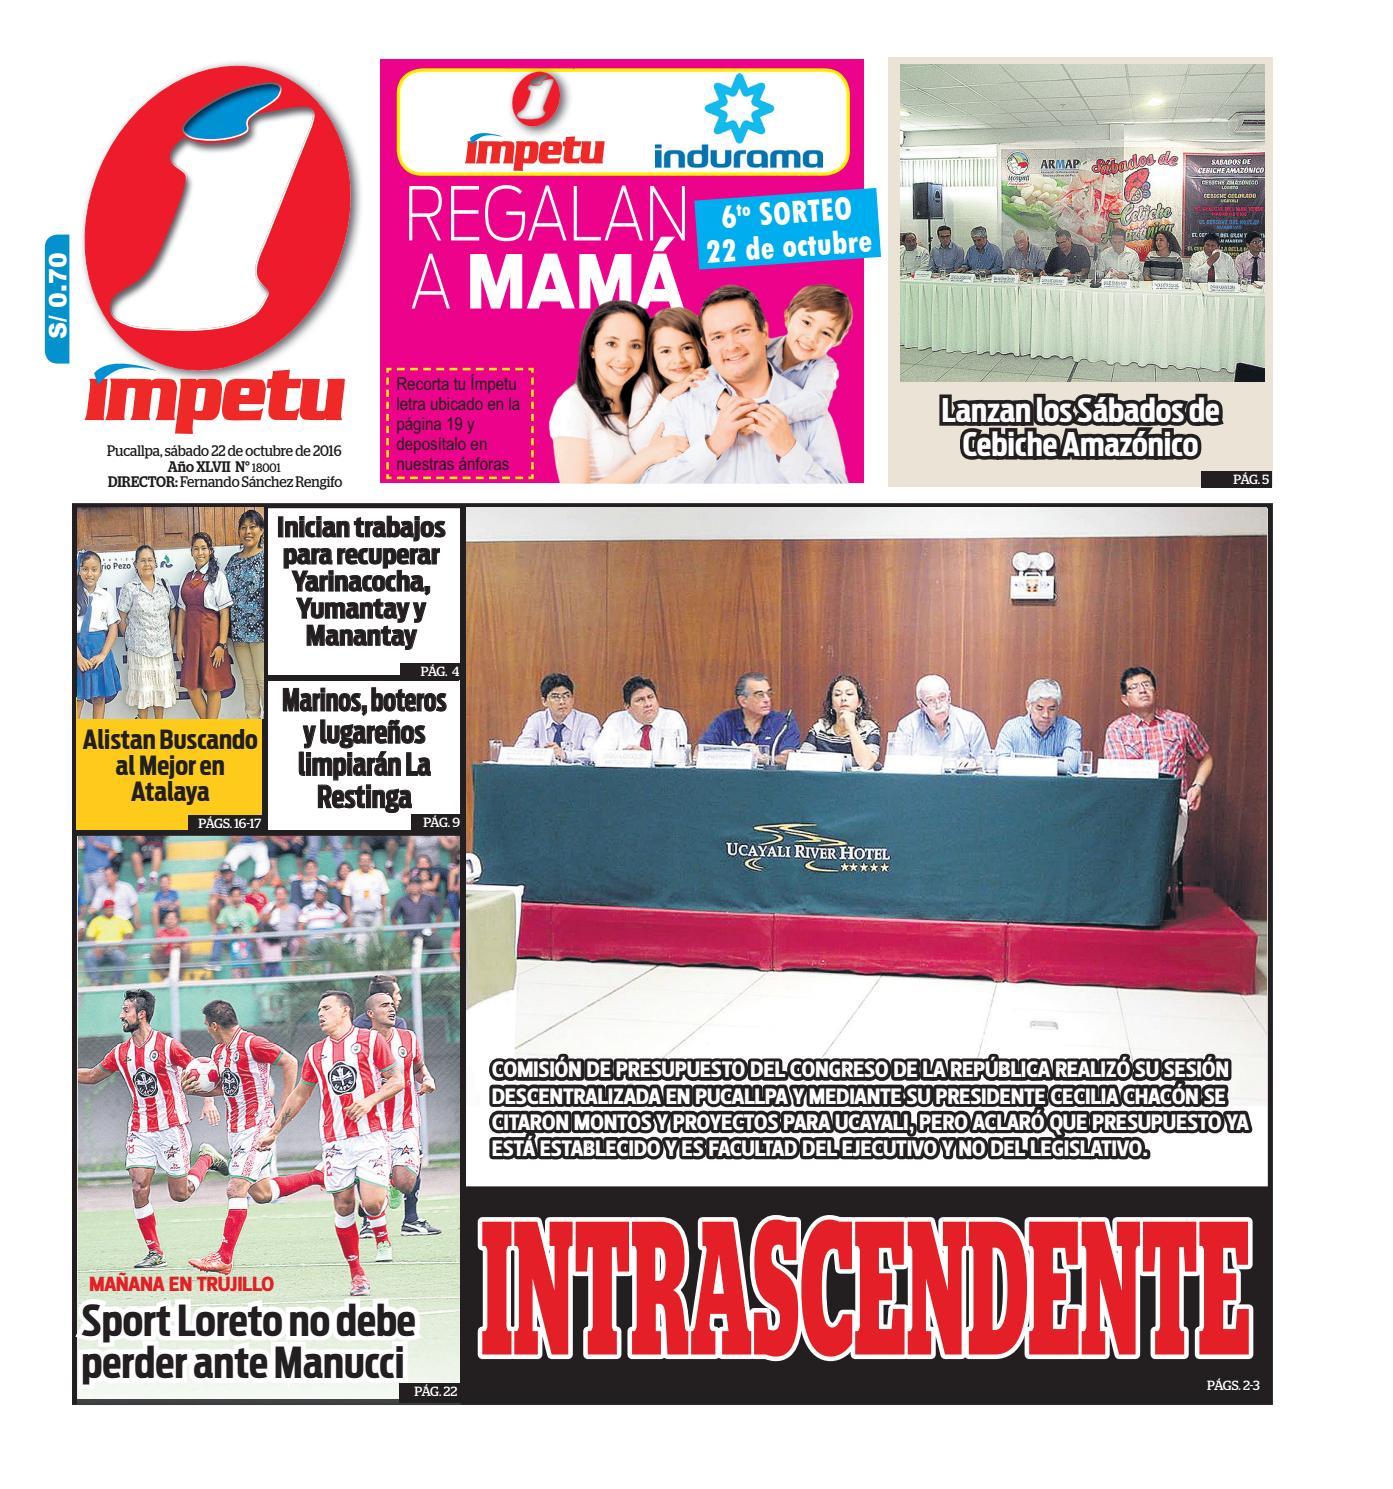 Impetu 22 de octubre de 2016 by Diario Ímpetu - issuu